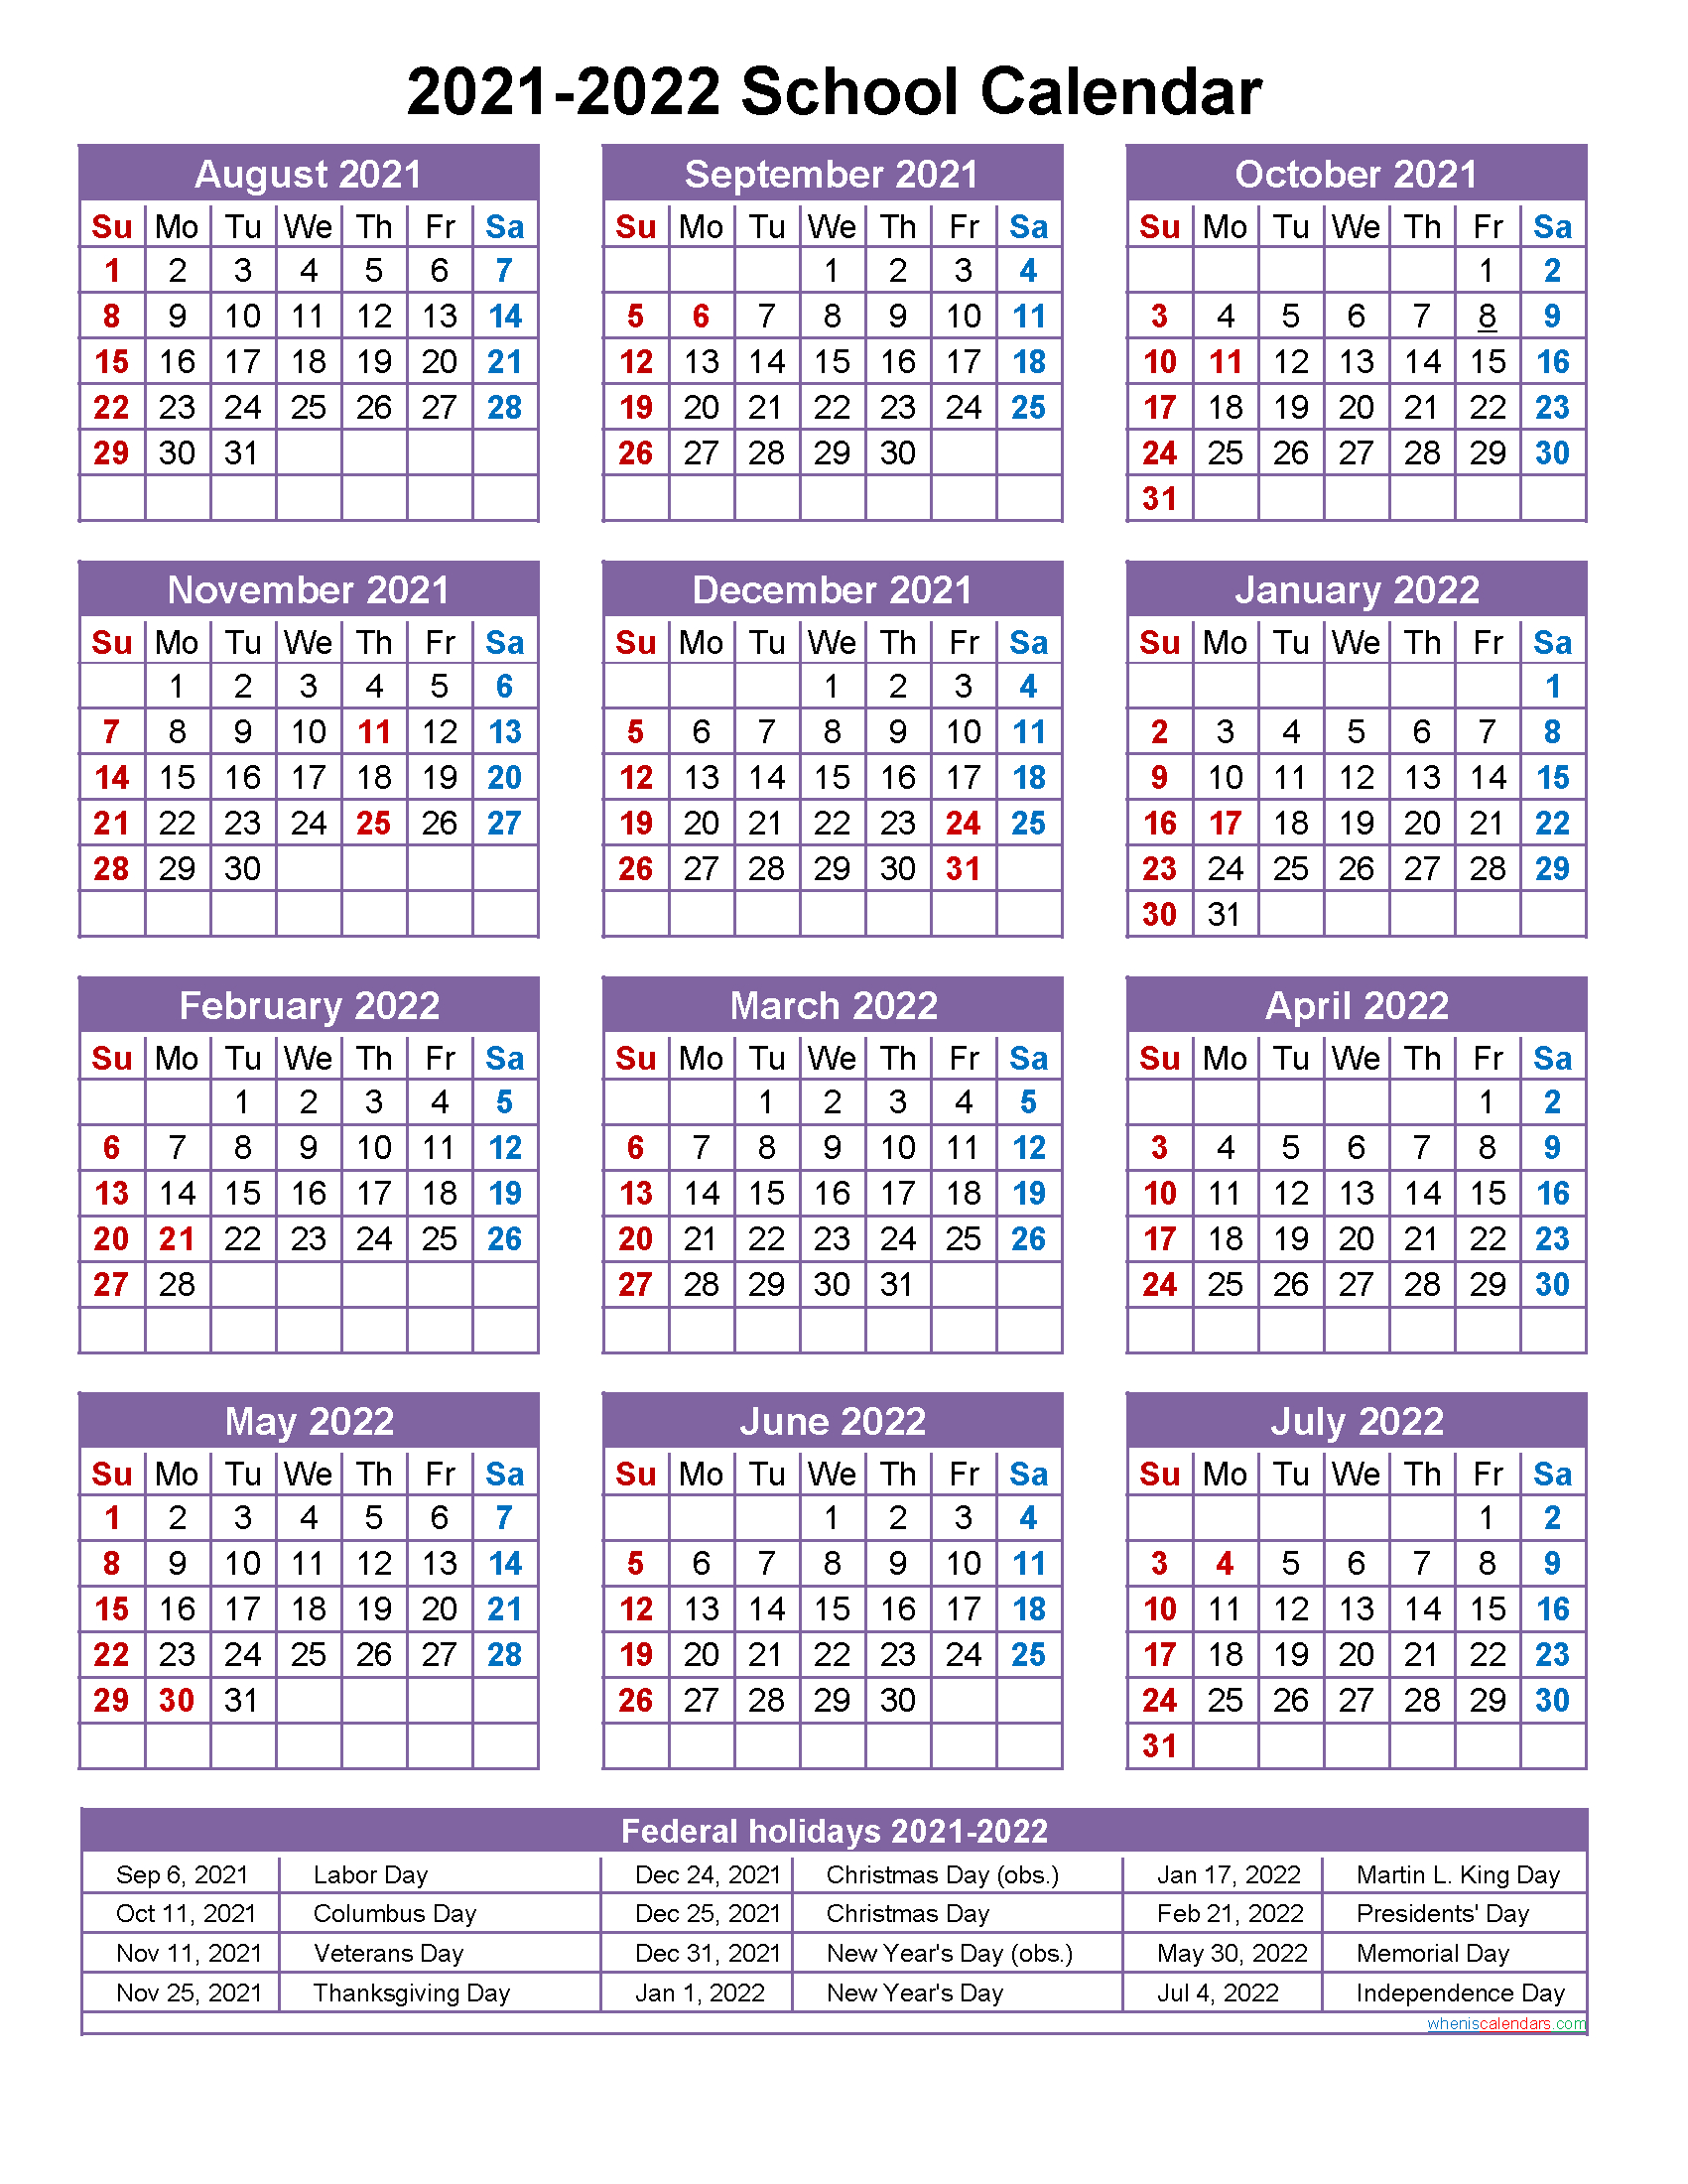 School Calendar 2021 And 2022 Printable (Portrait